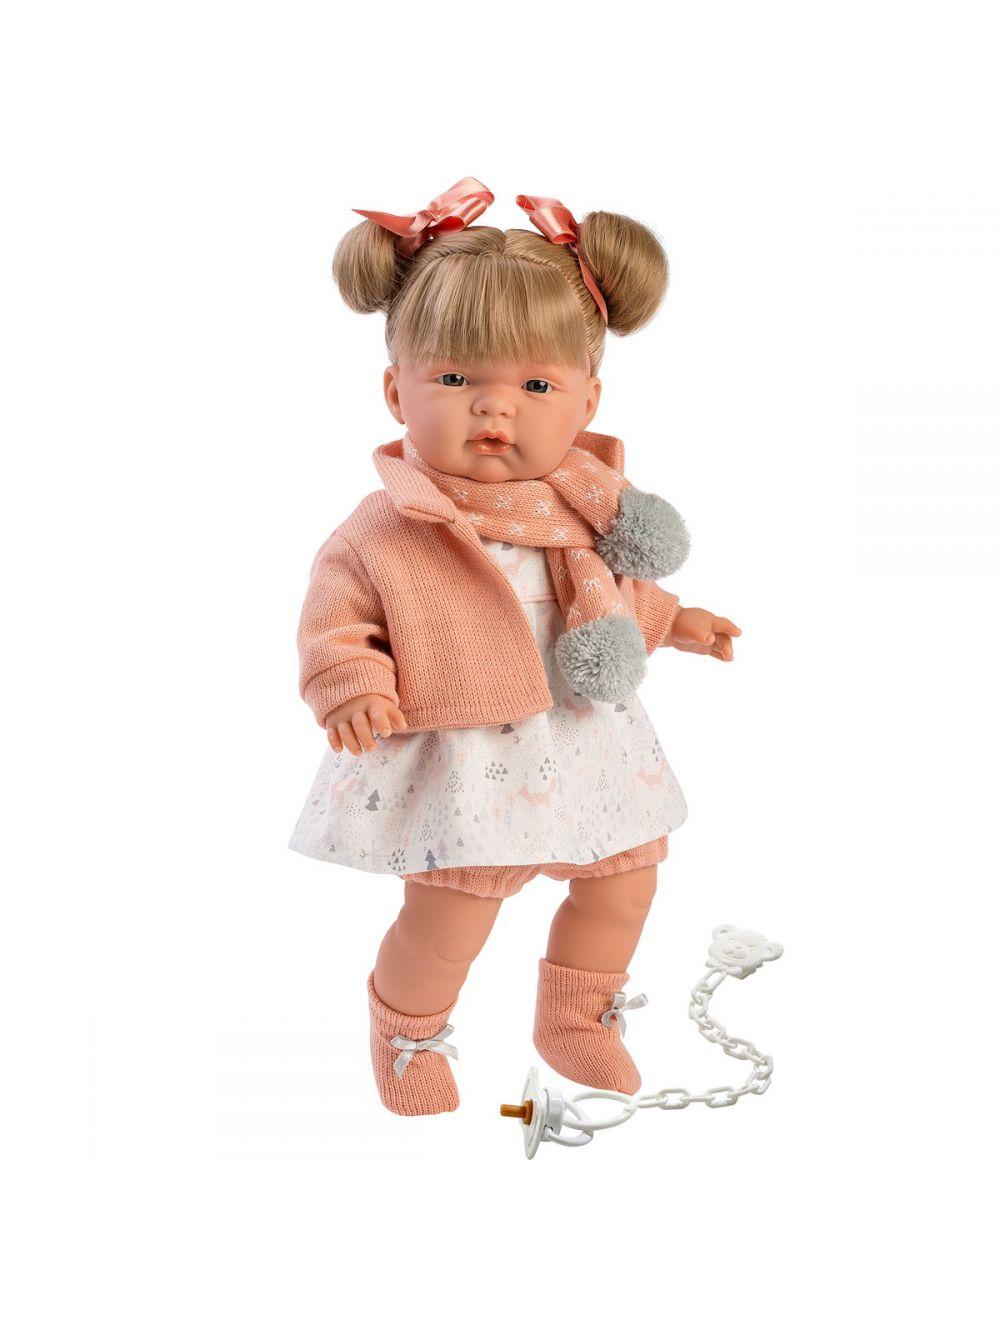 Llorens 38334 Lalka płacząca Joelle blondynka 38 cm łososiowa